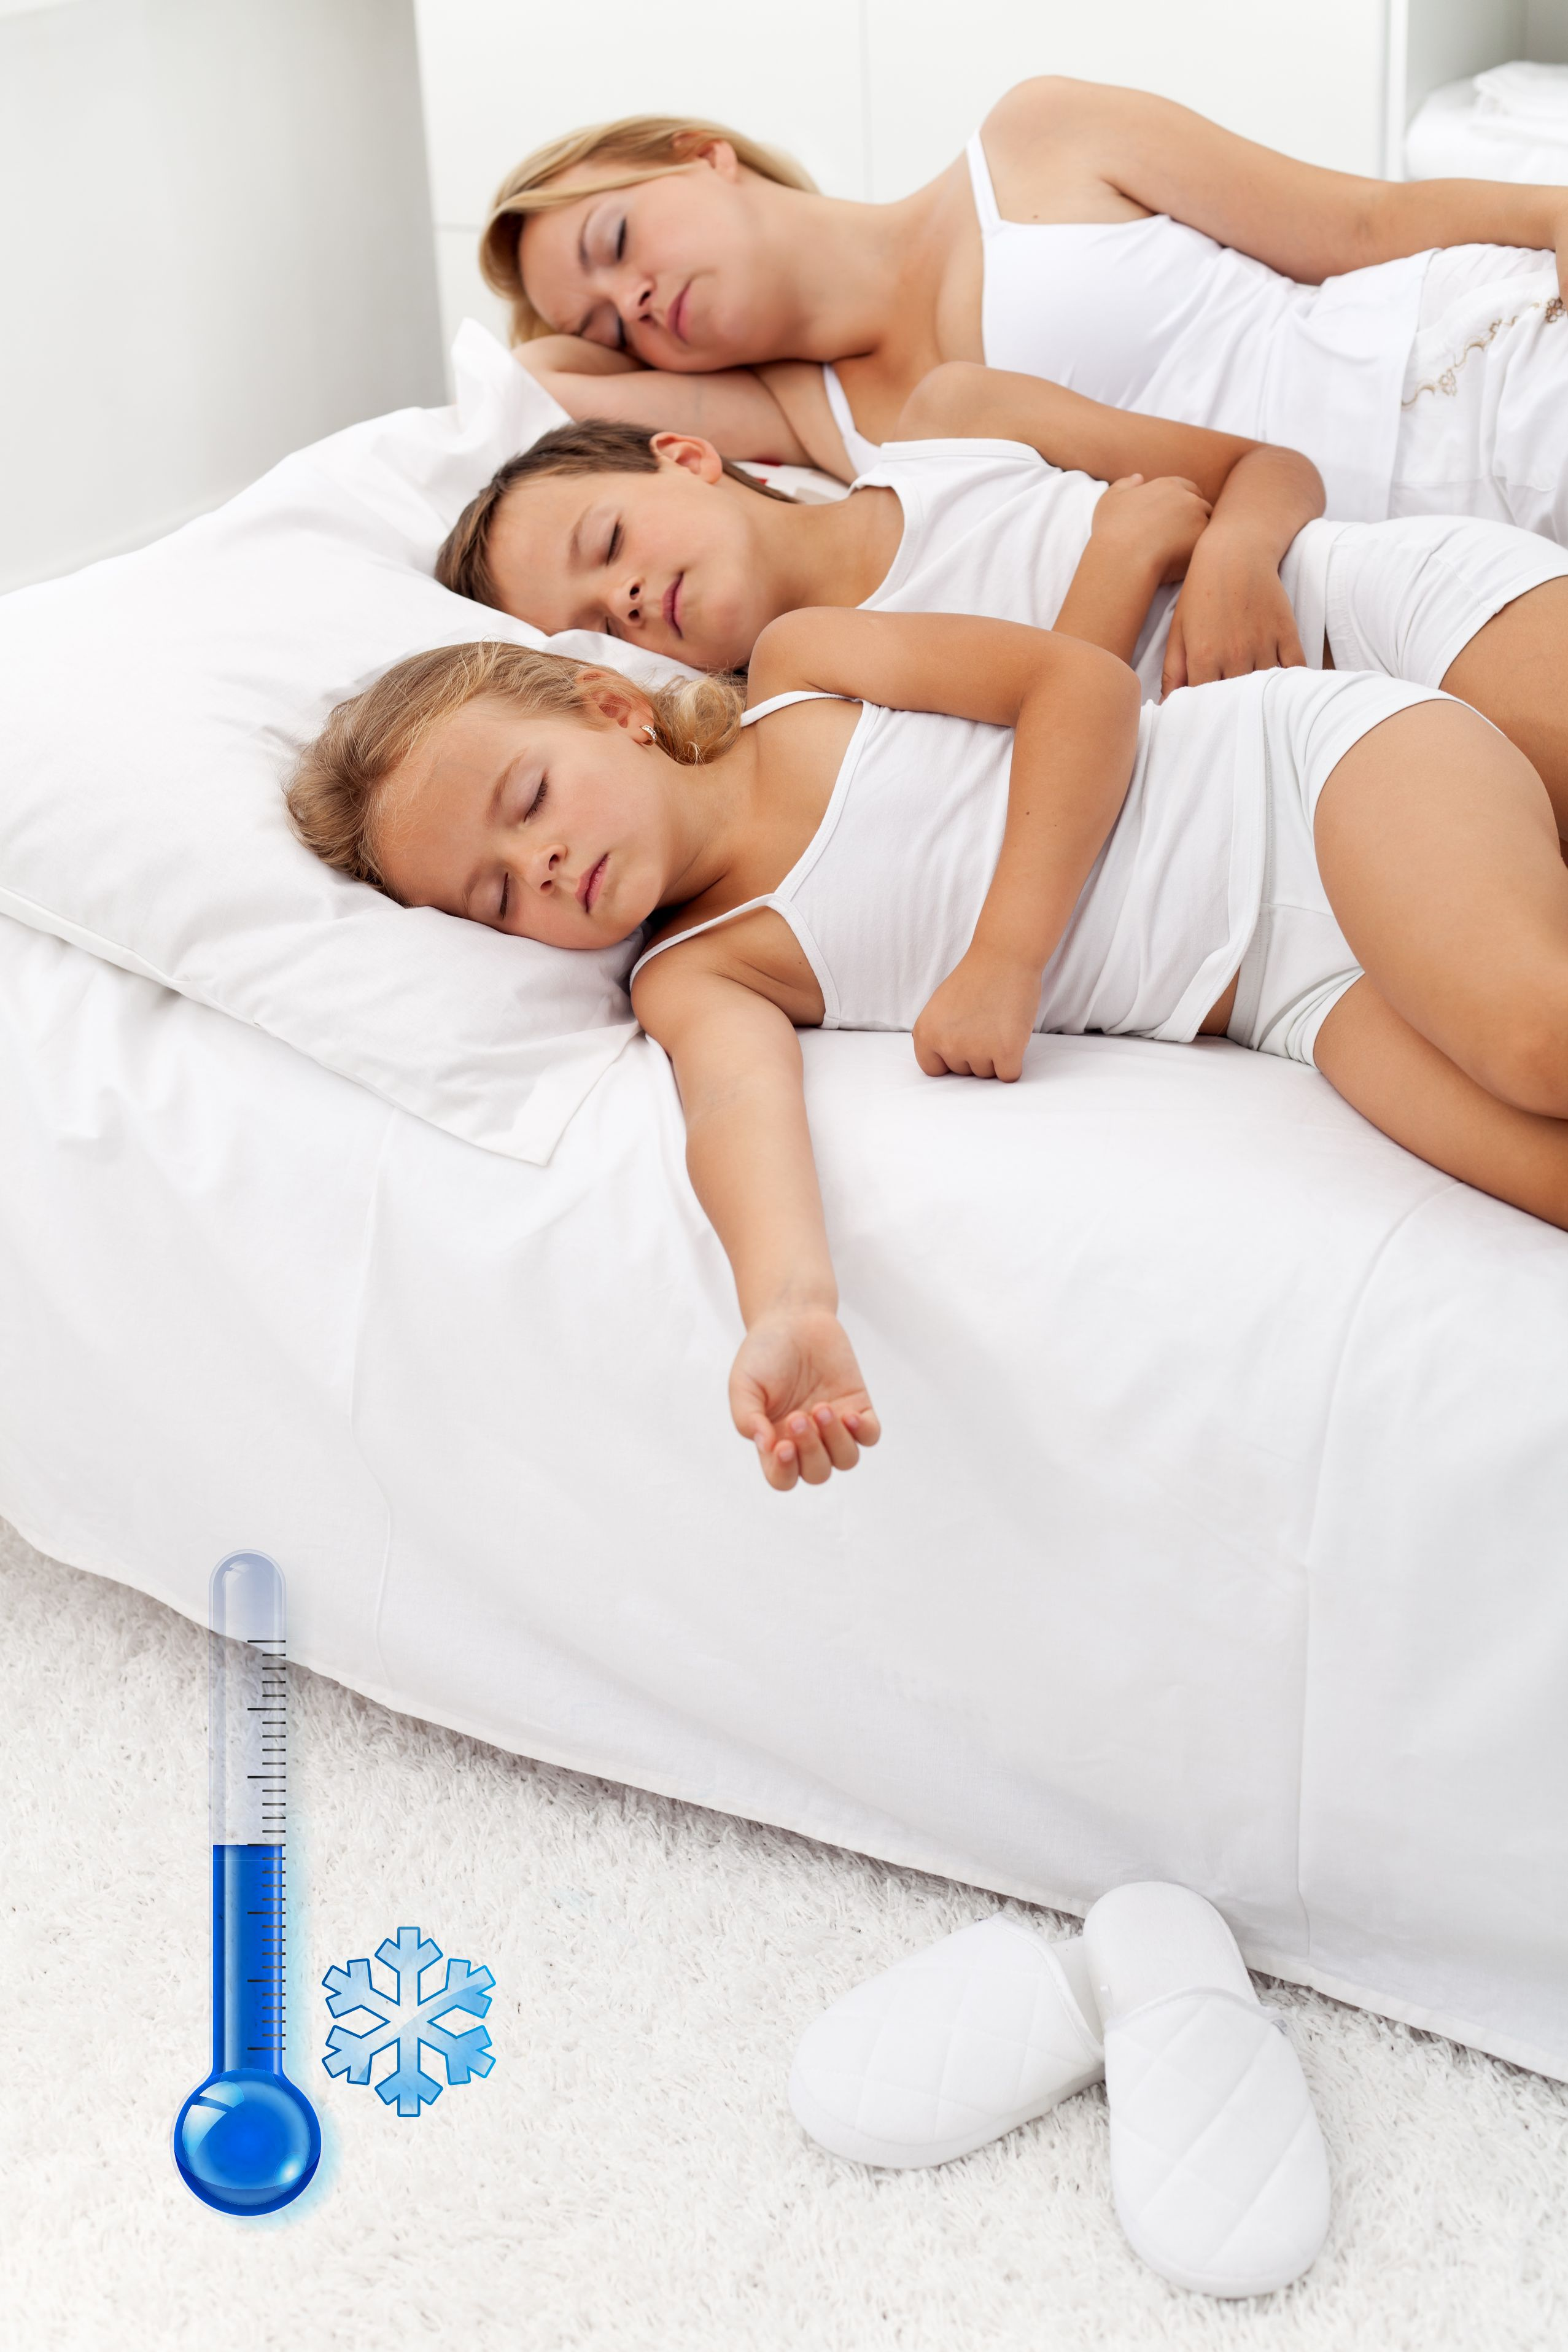 kryo a h rb topper sleep mattress betalist restful ixlib deep image startups for the cooling